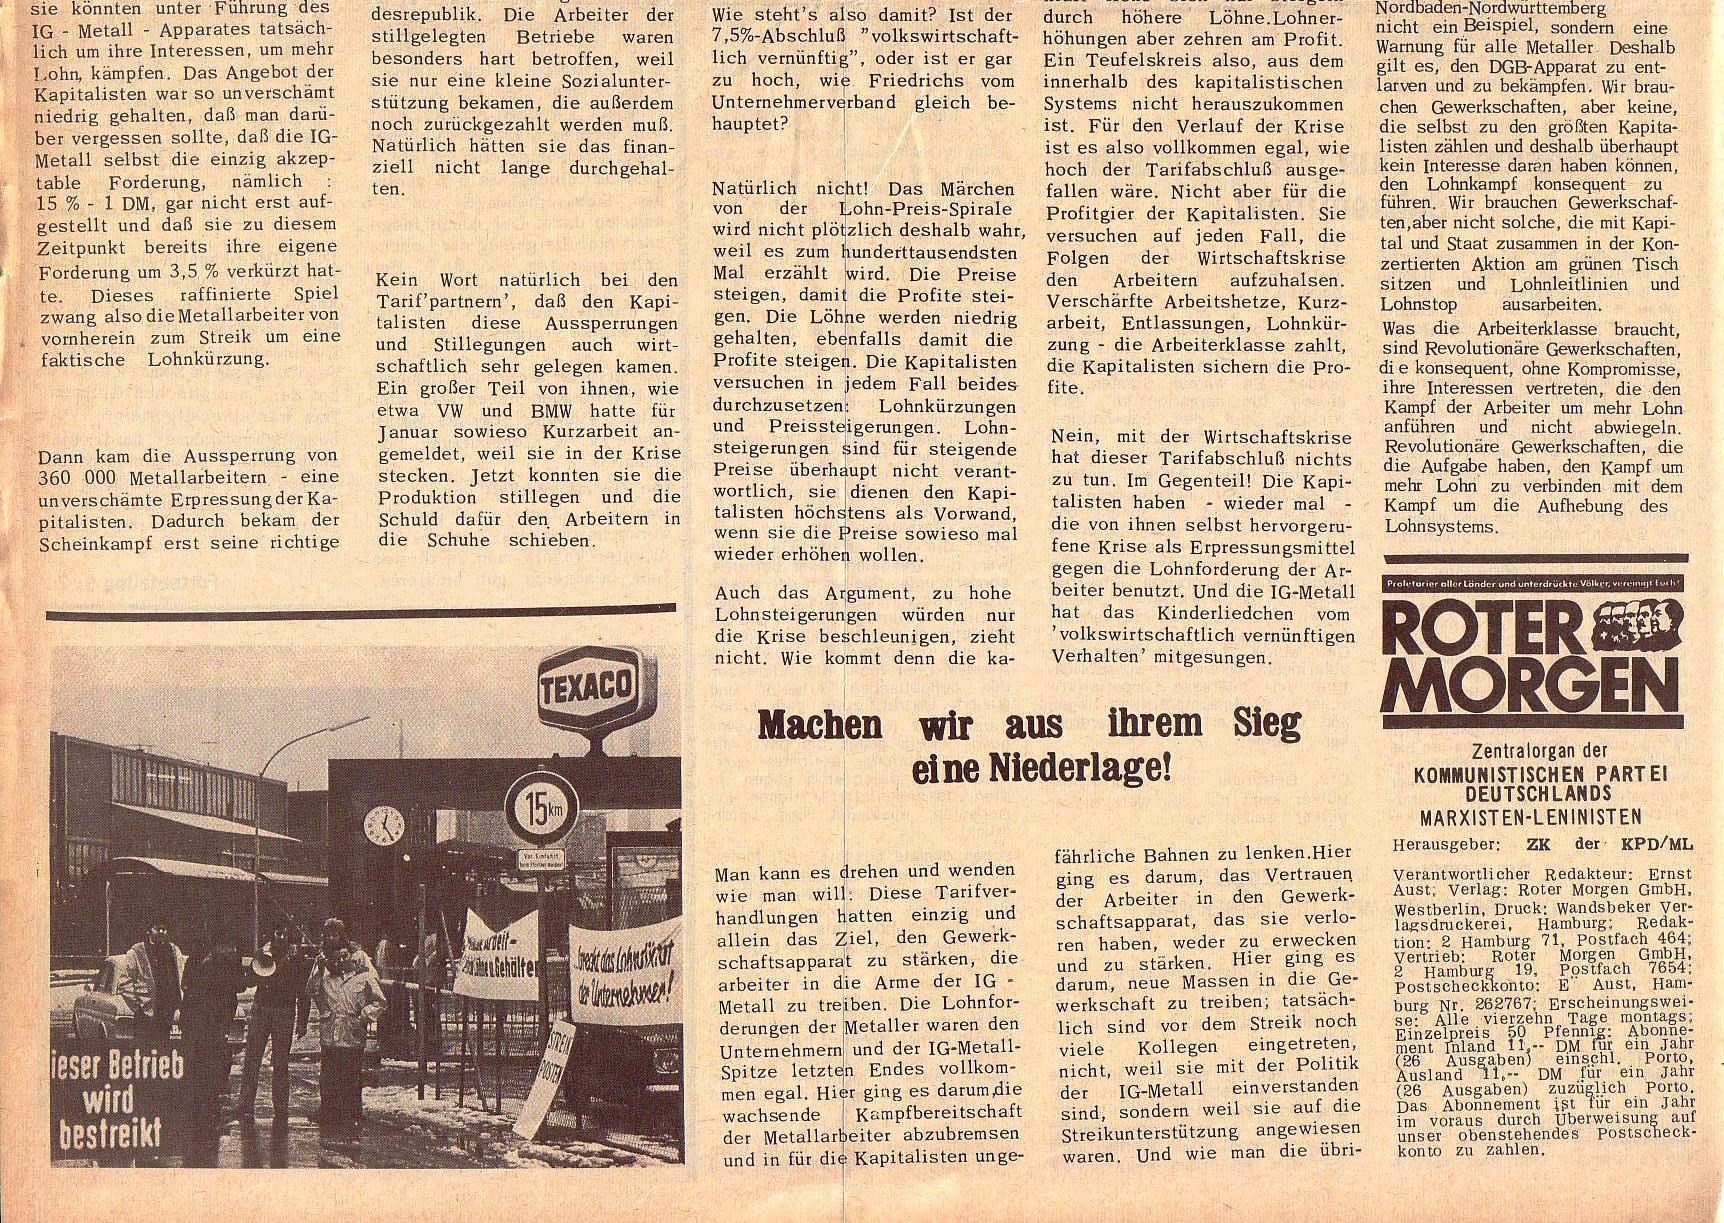 Roter Morgen, 5. Jg., 27. Dezember 1971, Nr. 16, Seite 2b